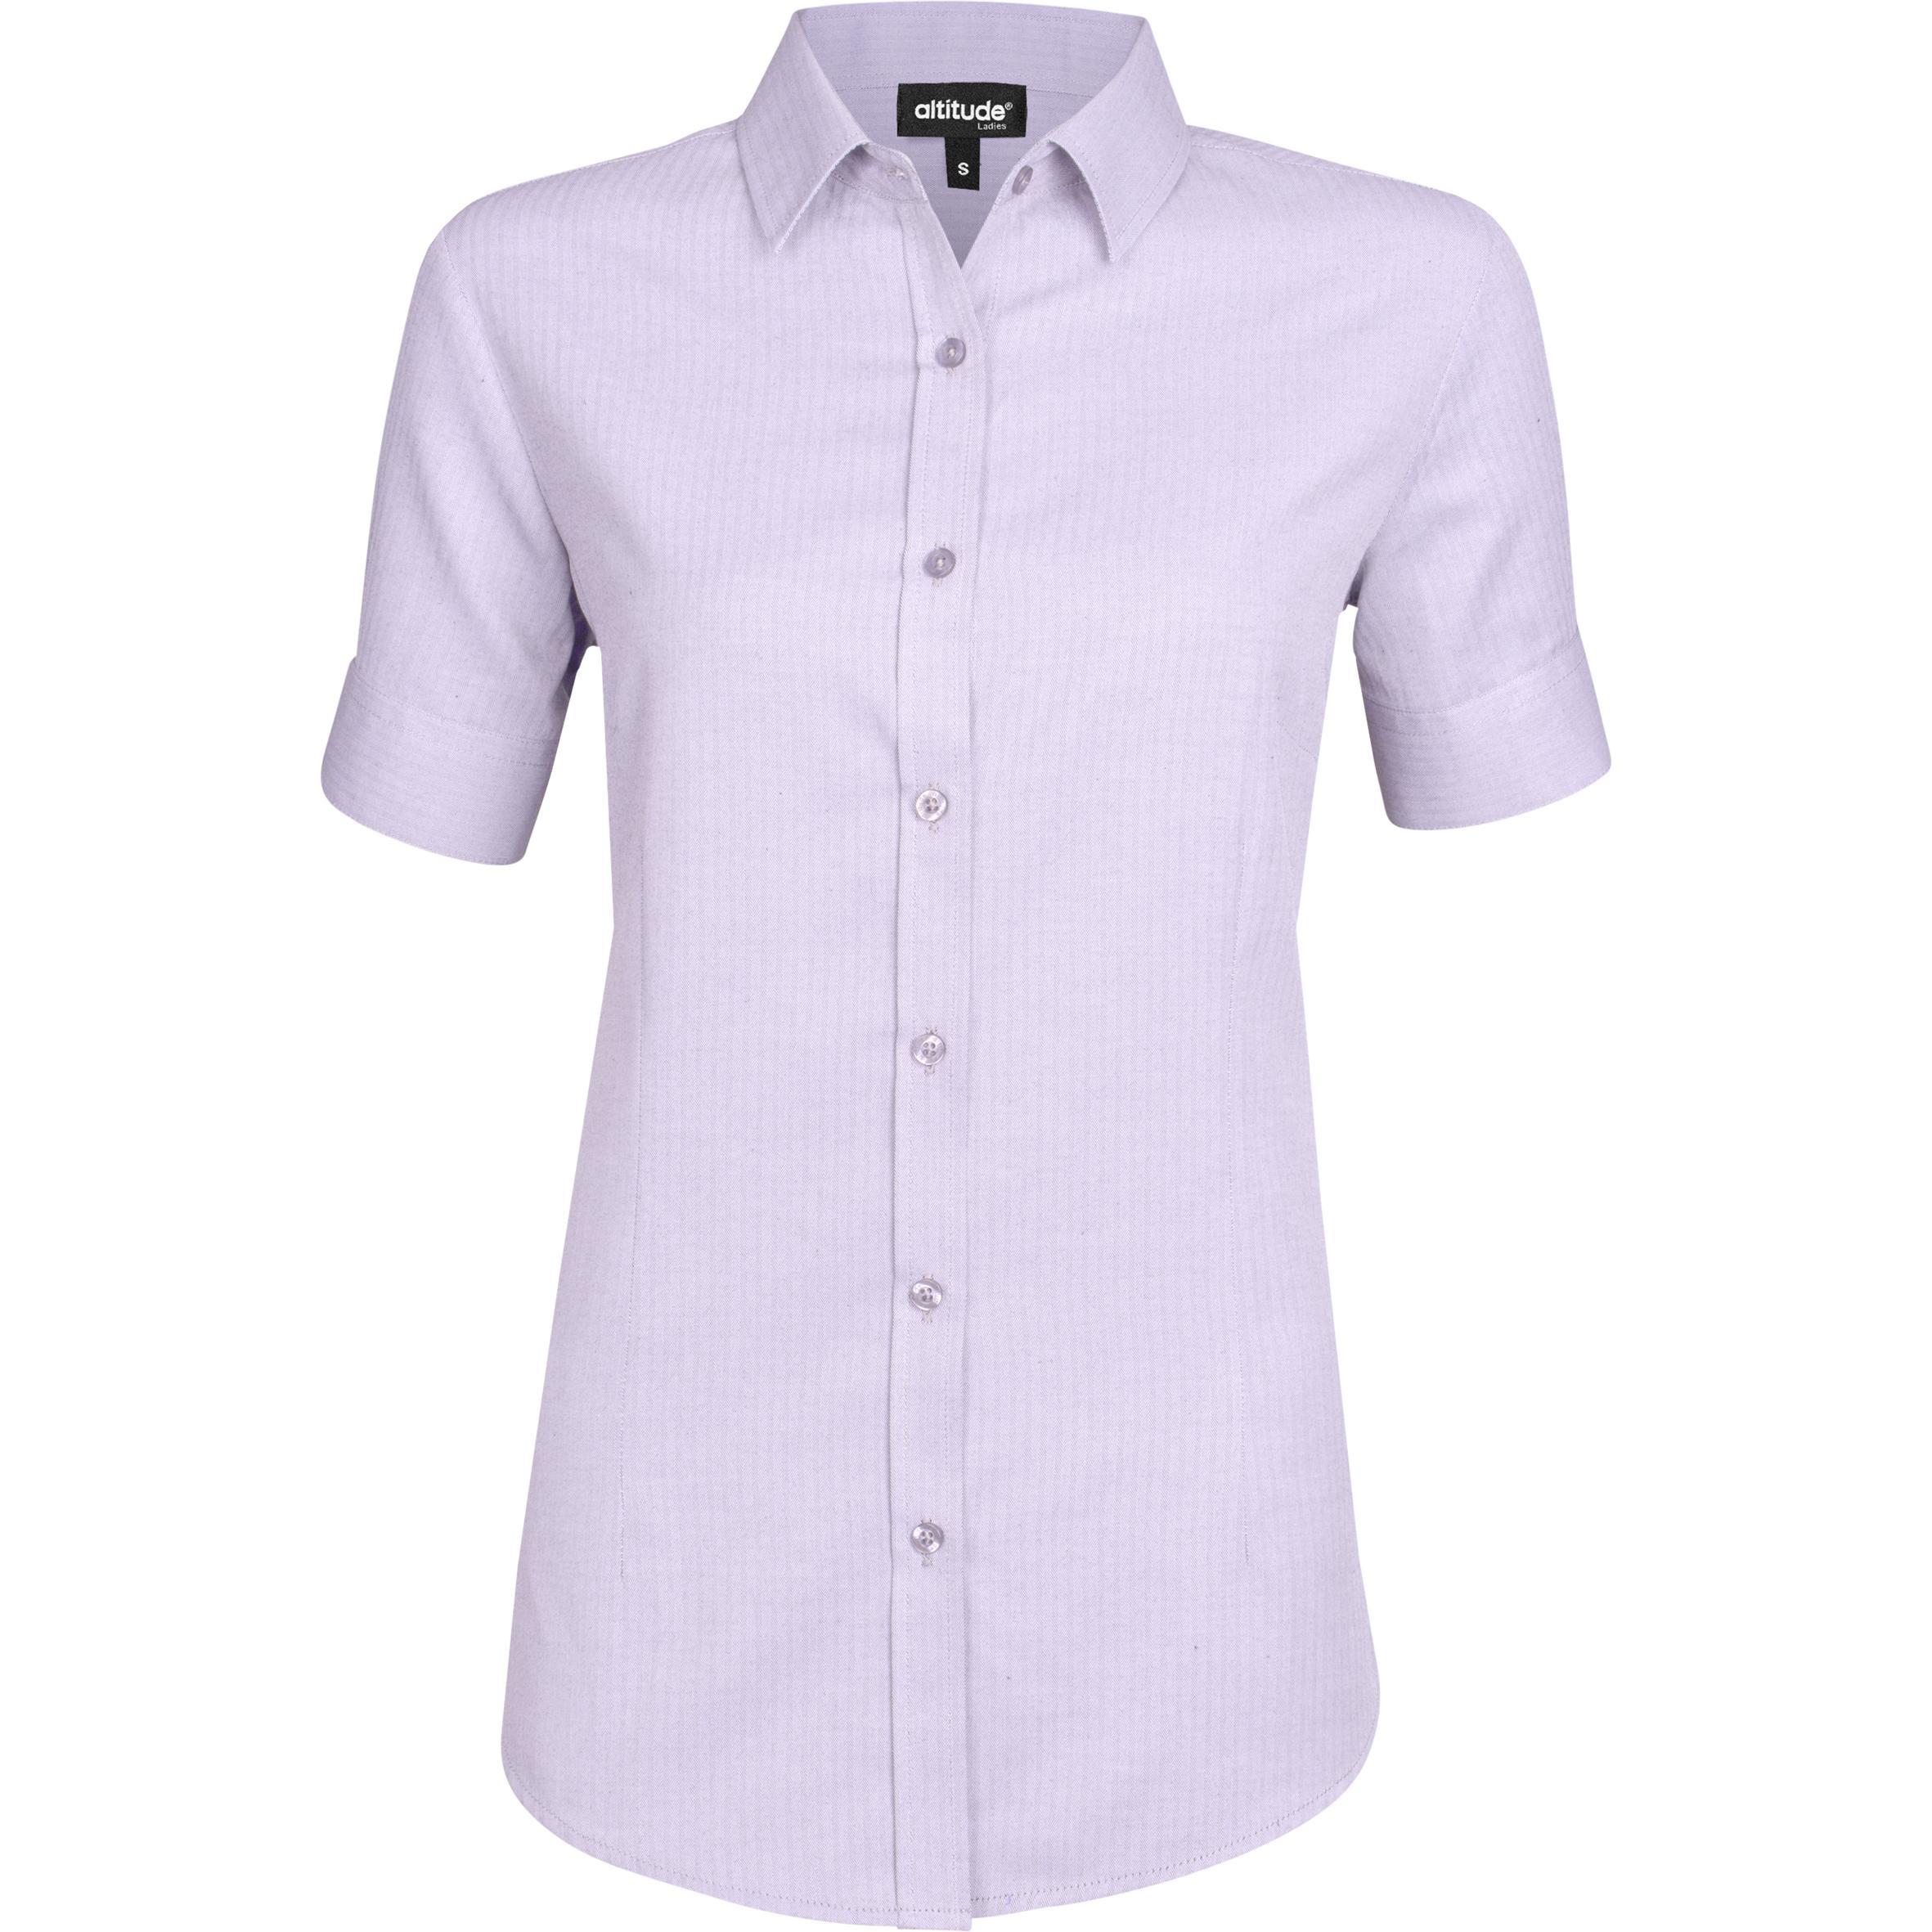 Ladies Short Sleeve Nottingham Shirt - Purple Only